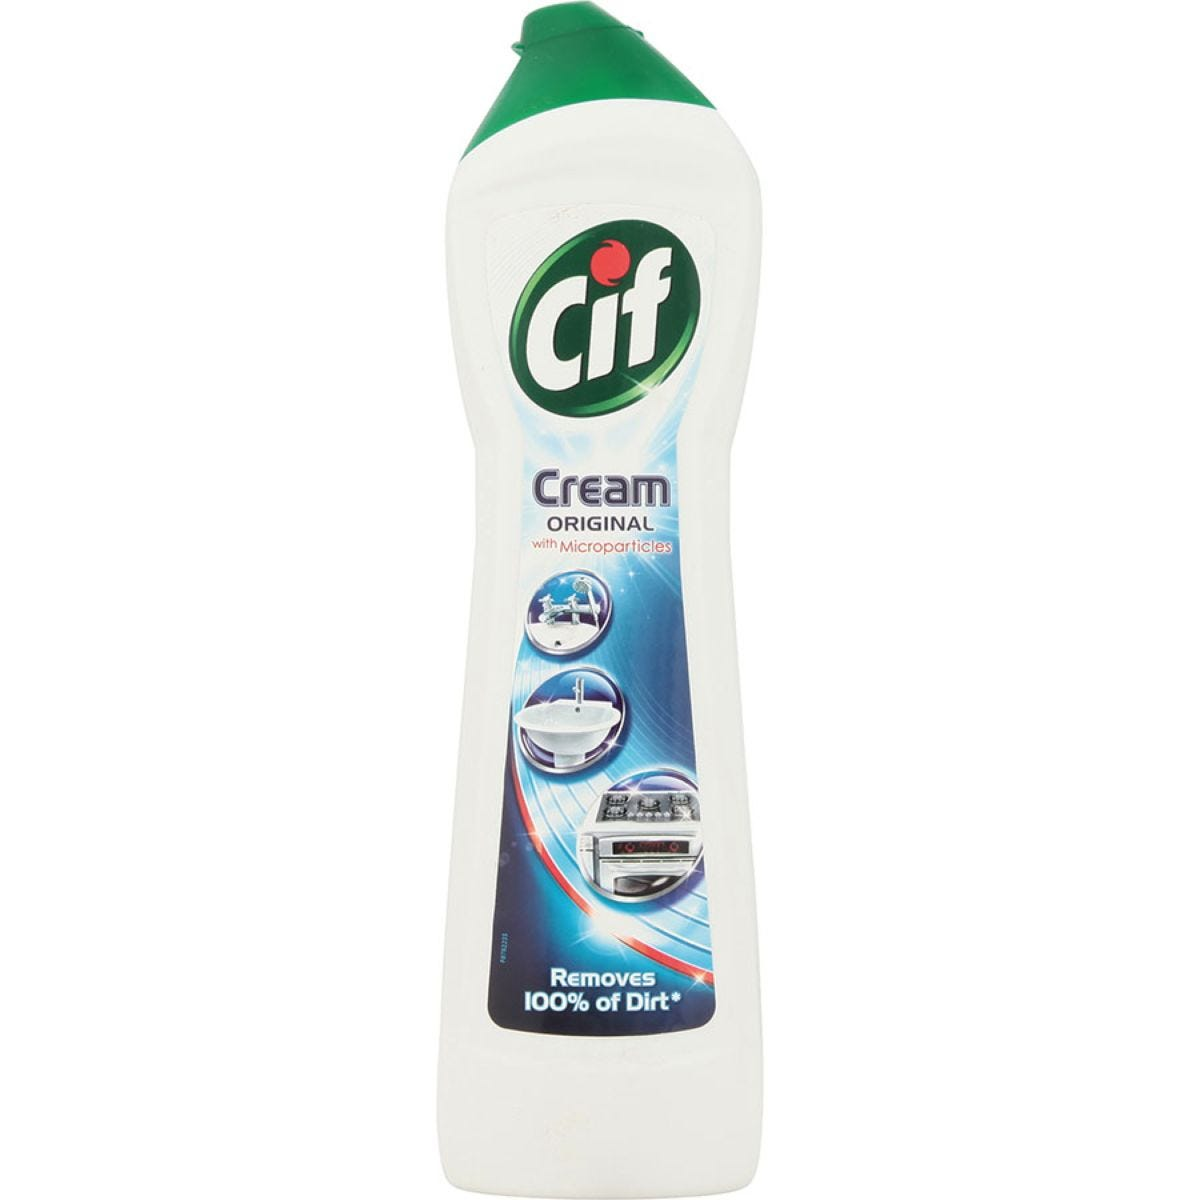 Cif White Cream Cleaner - 500ml